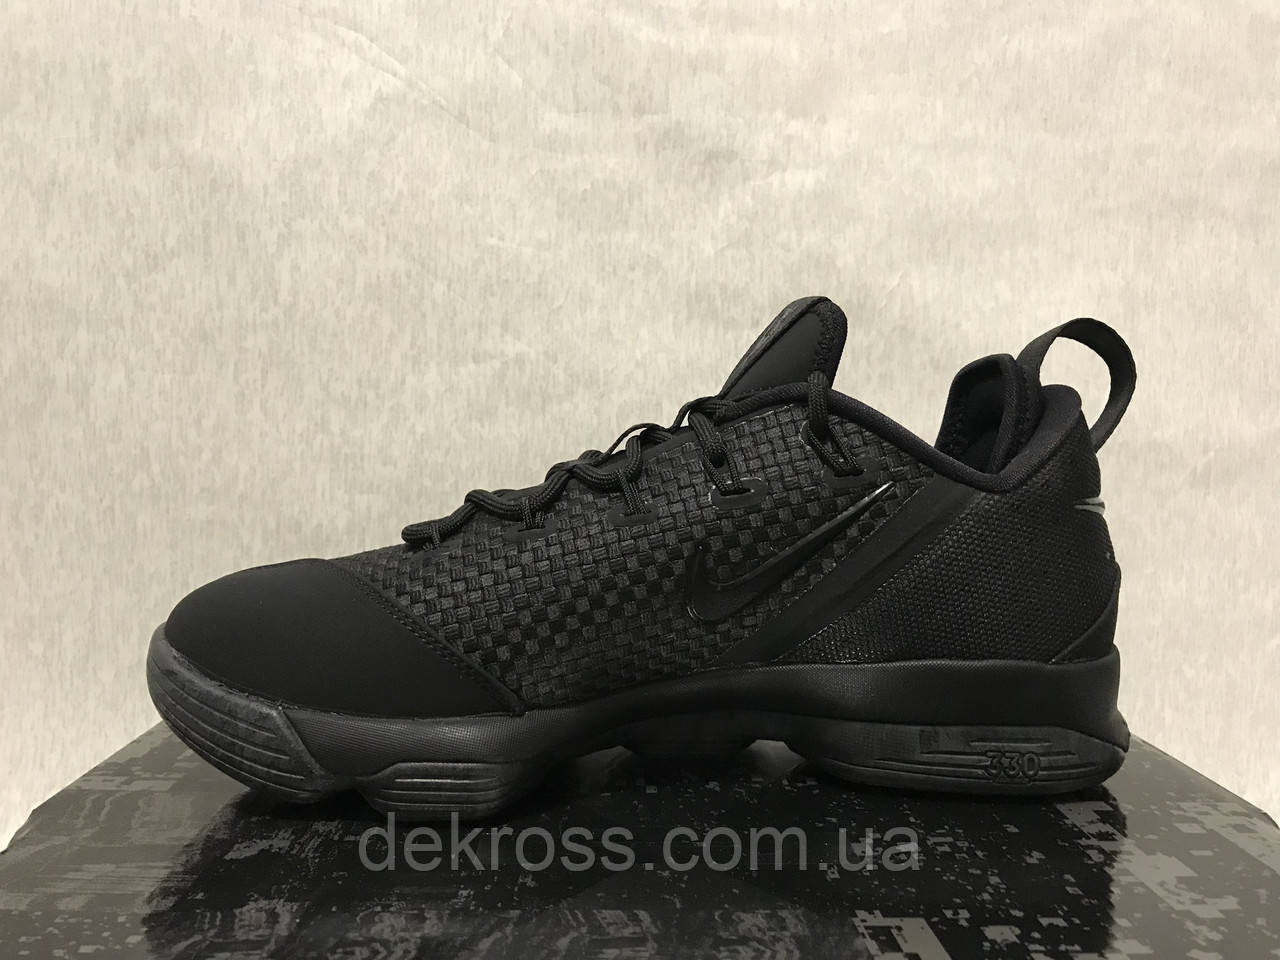 170f698f6ae Кроссовки баскетбольные Nike LeBron 14 Low Оригинал 878636-002 ...